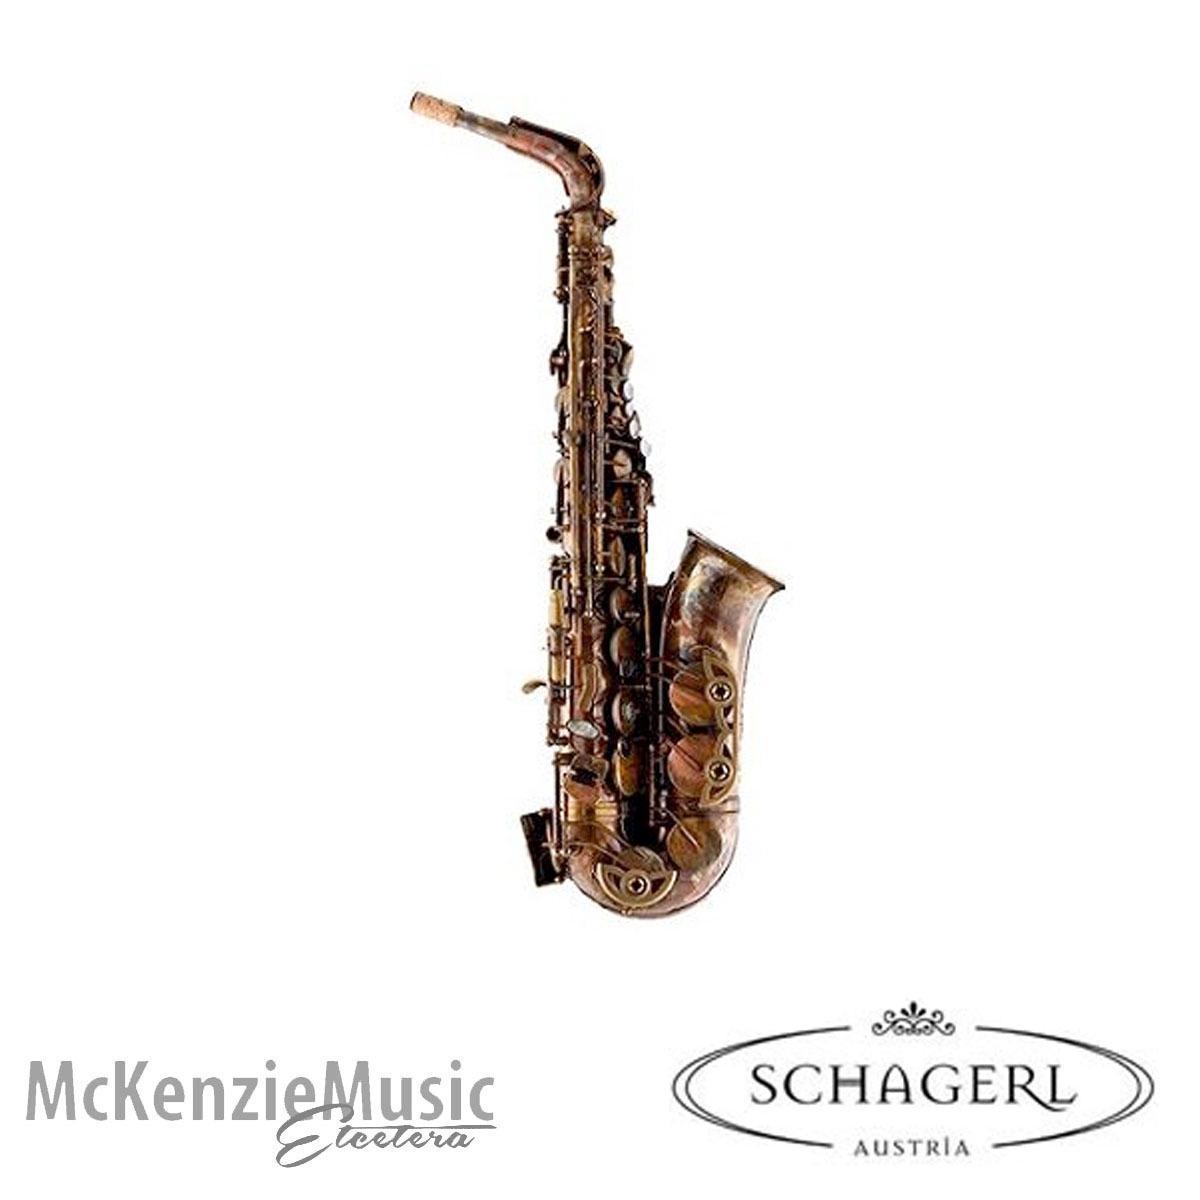 Schagerl Superior Alto Saxophone Vintage